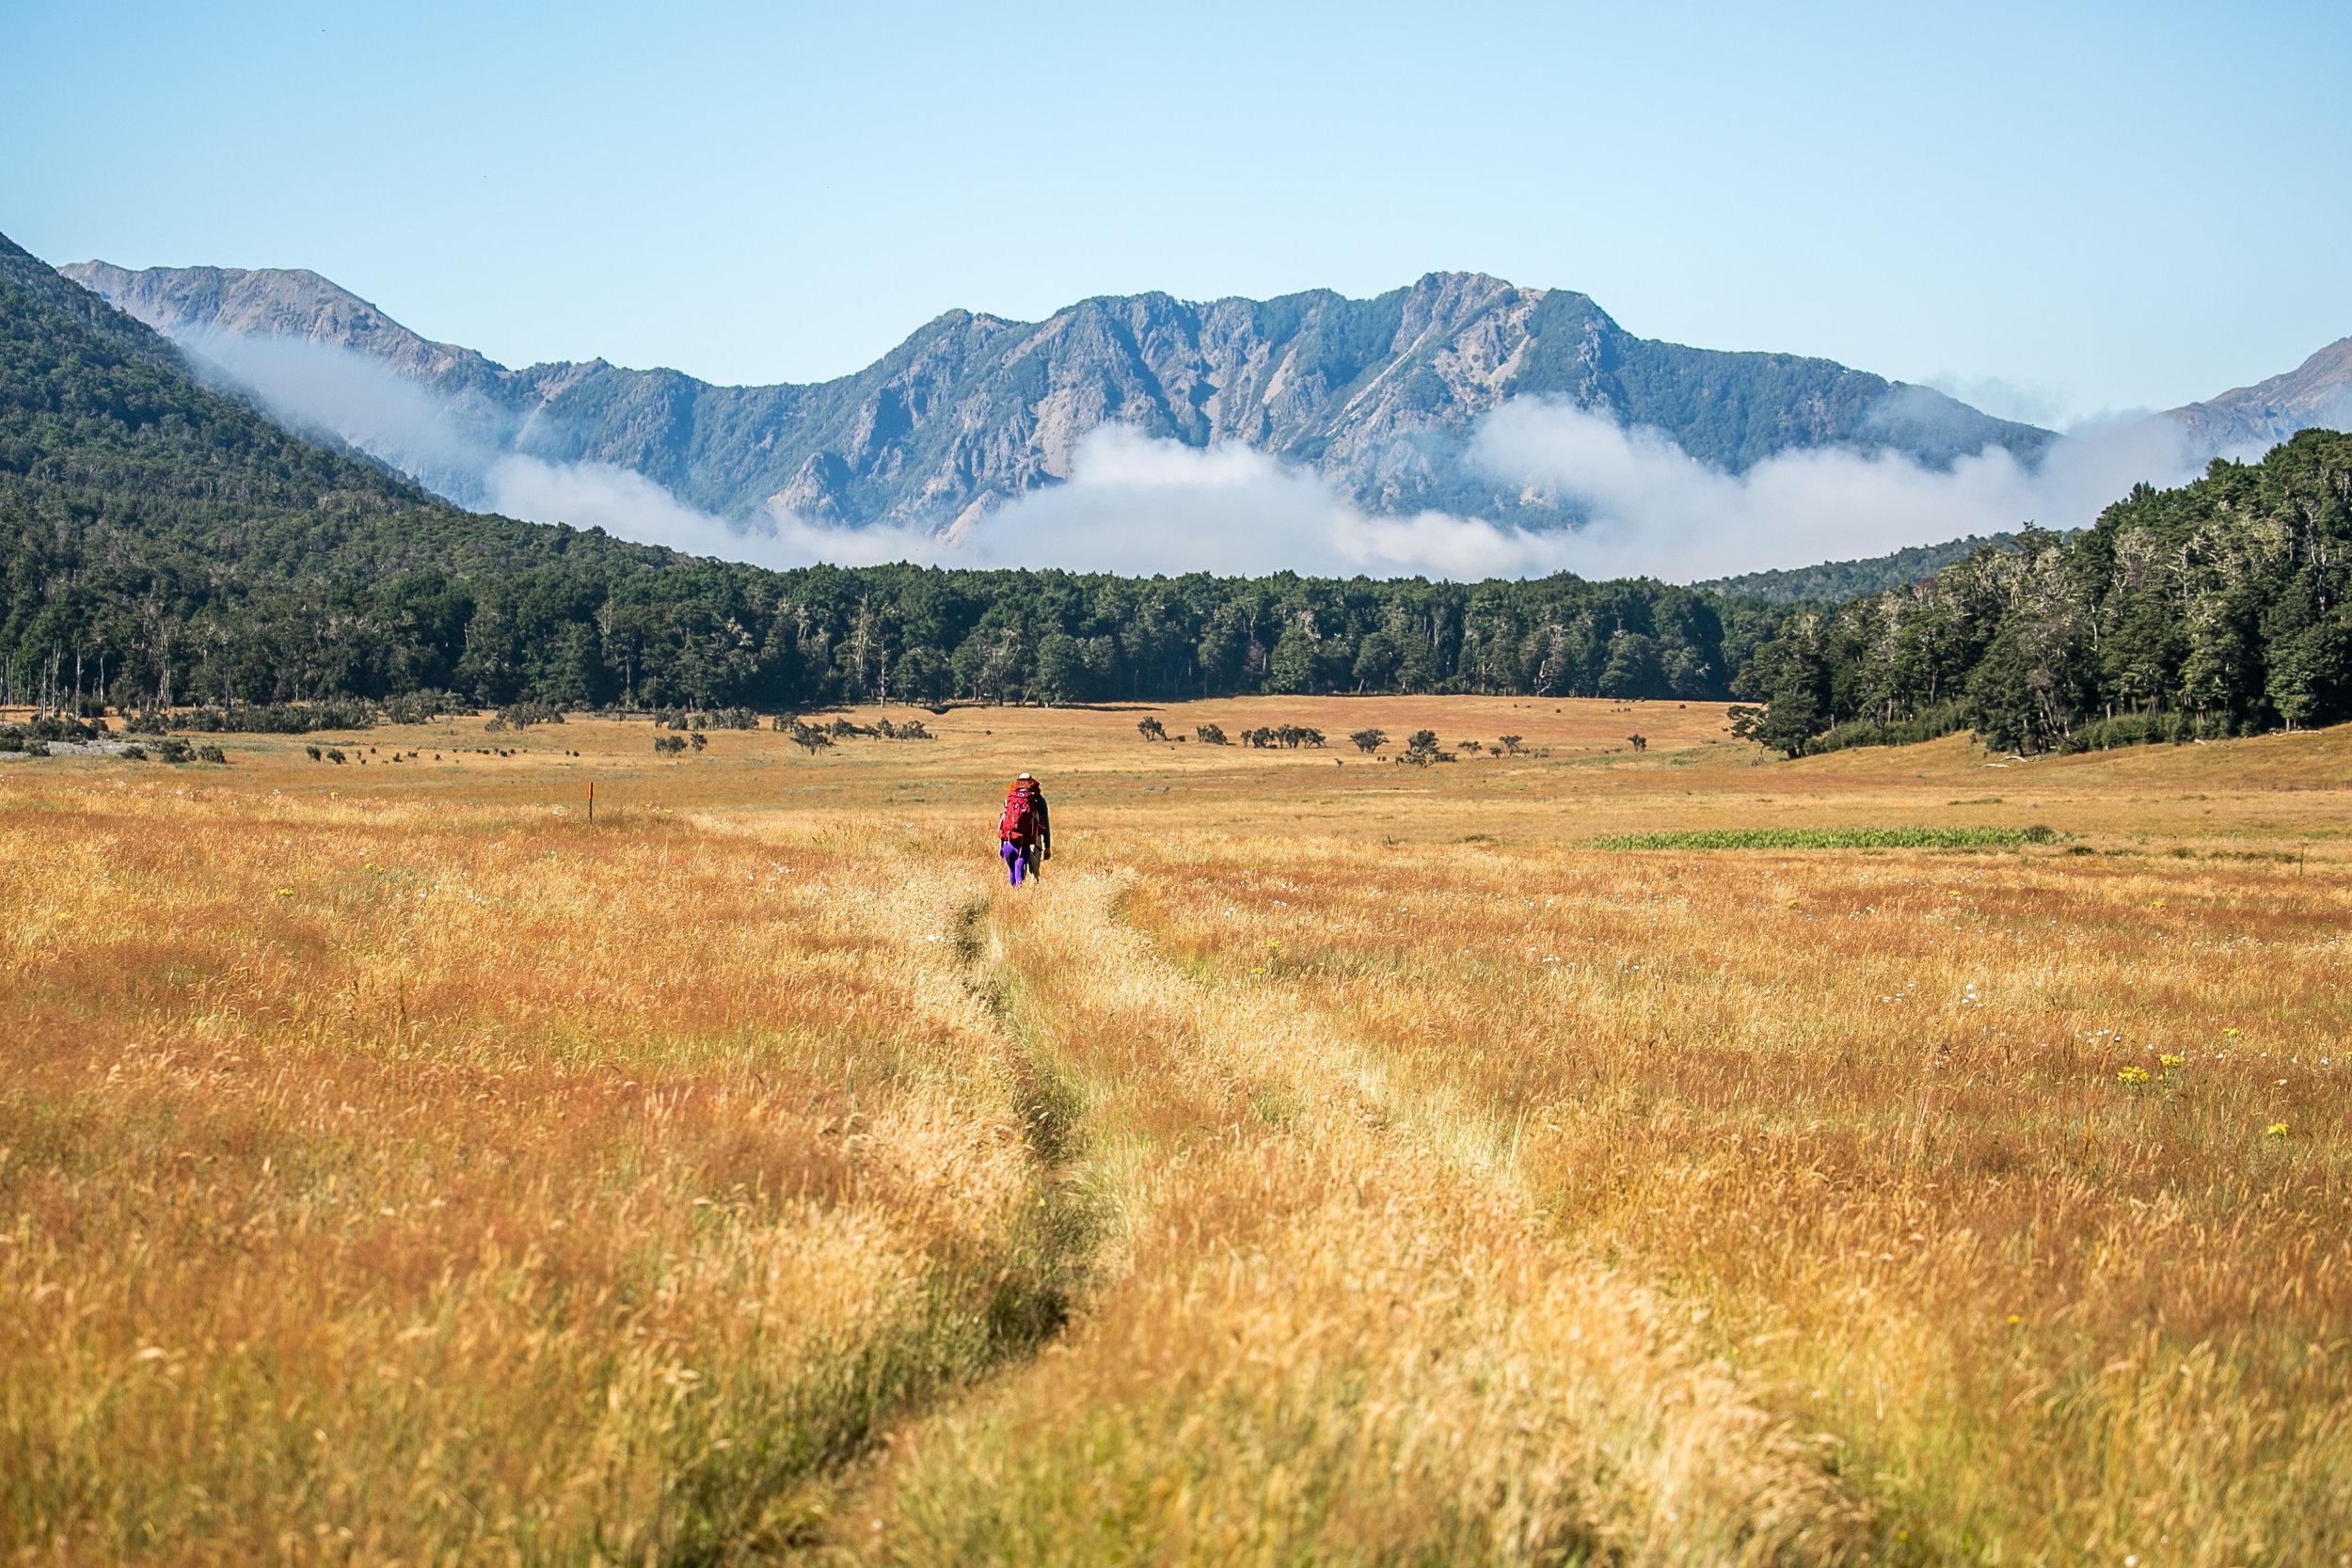 LAKE SUMNER FOREST PARK - Hiking through grassland valleys on New Zealand's Te Araroa